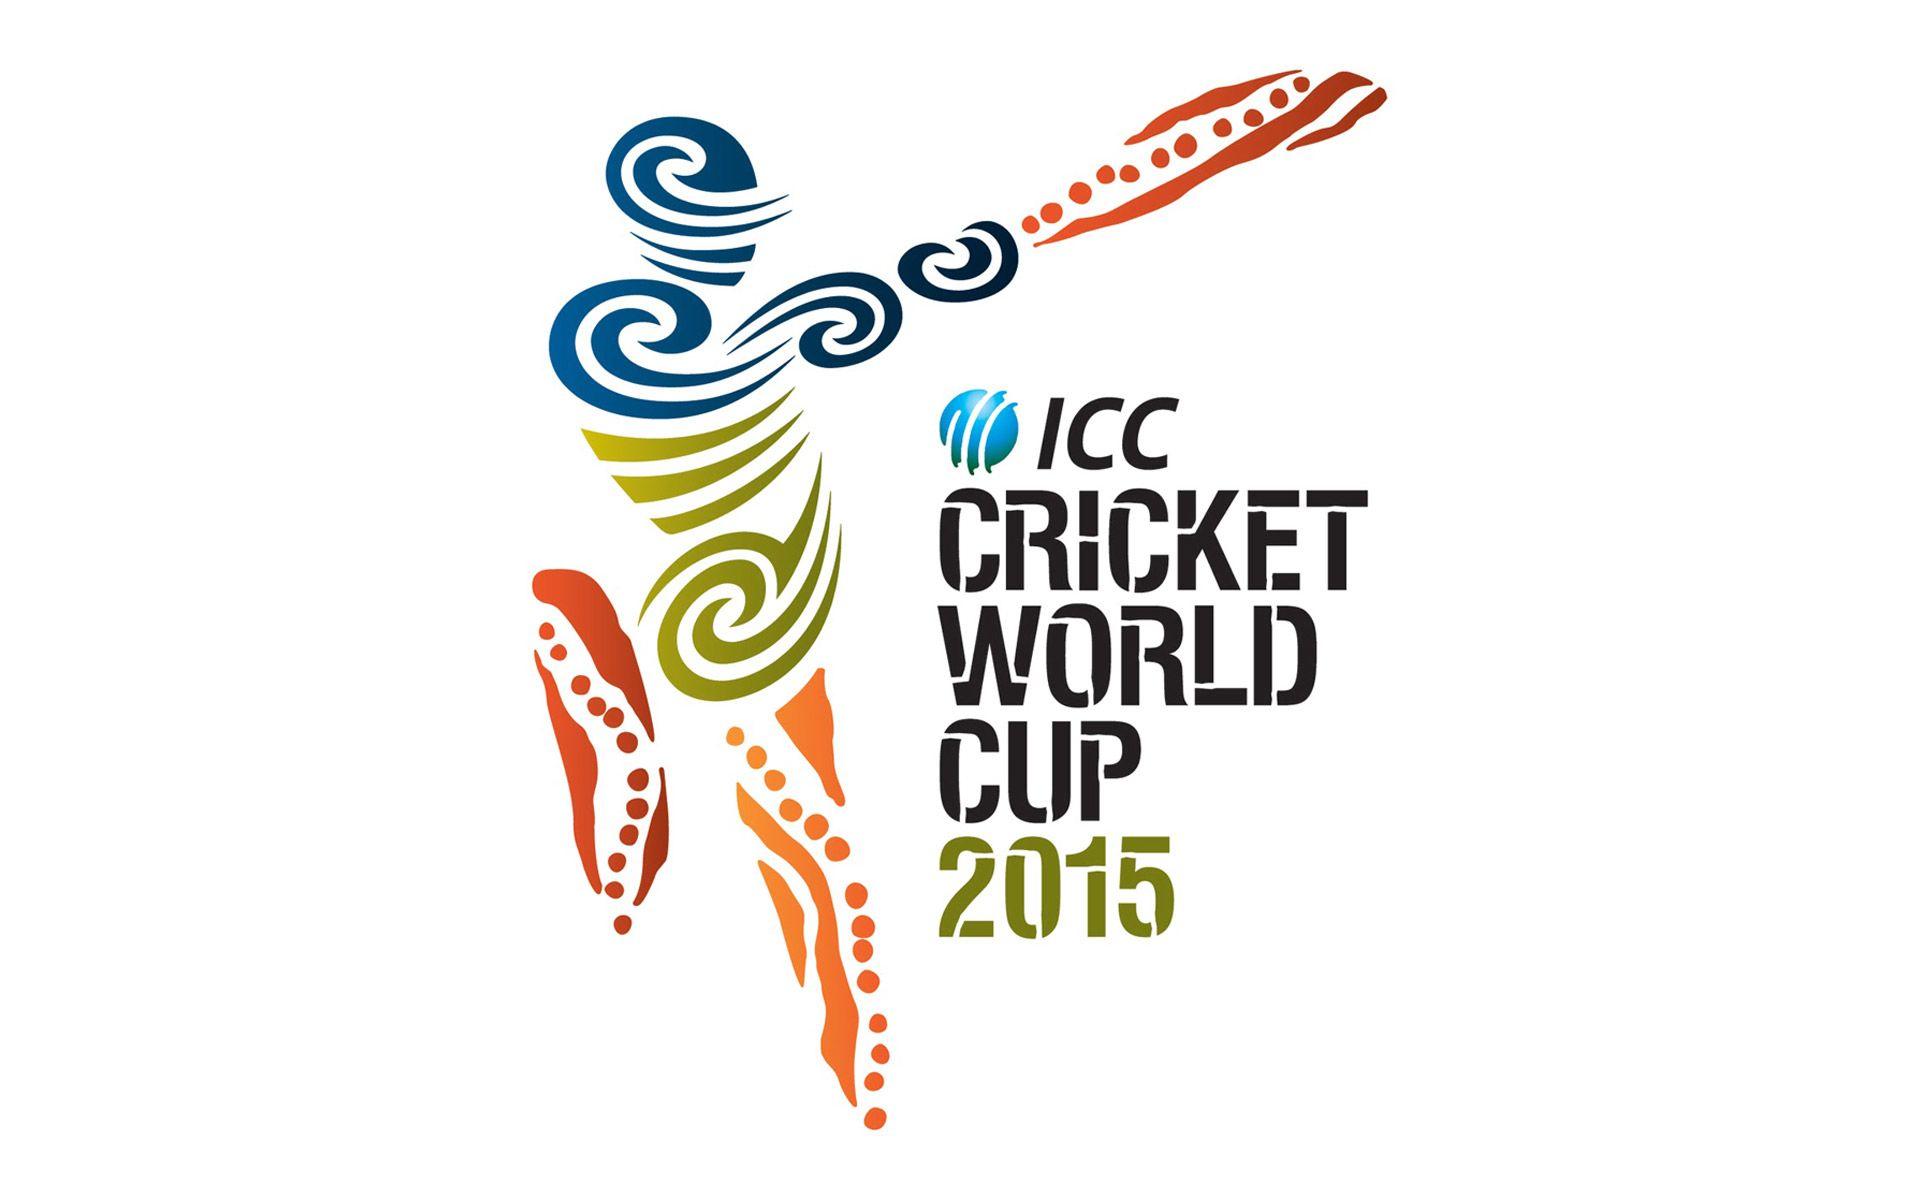 icc world cup 2015 match schedule pdf download